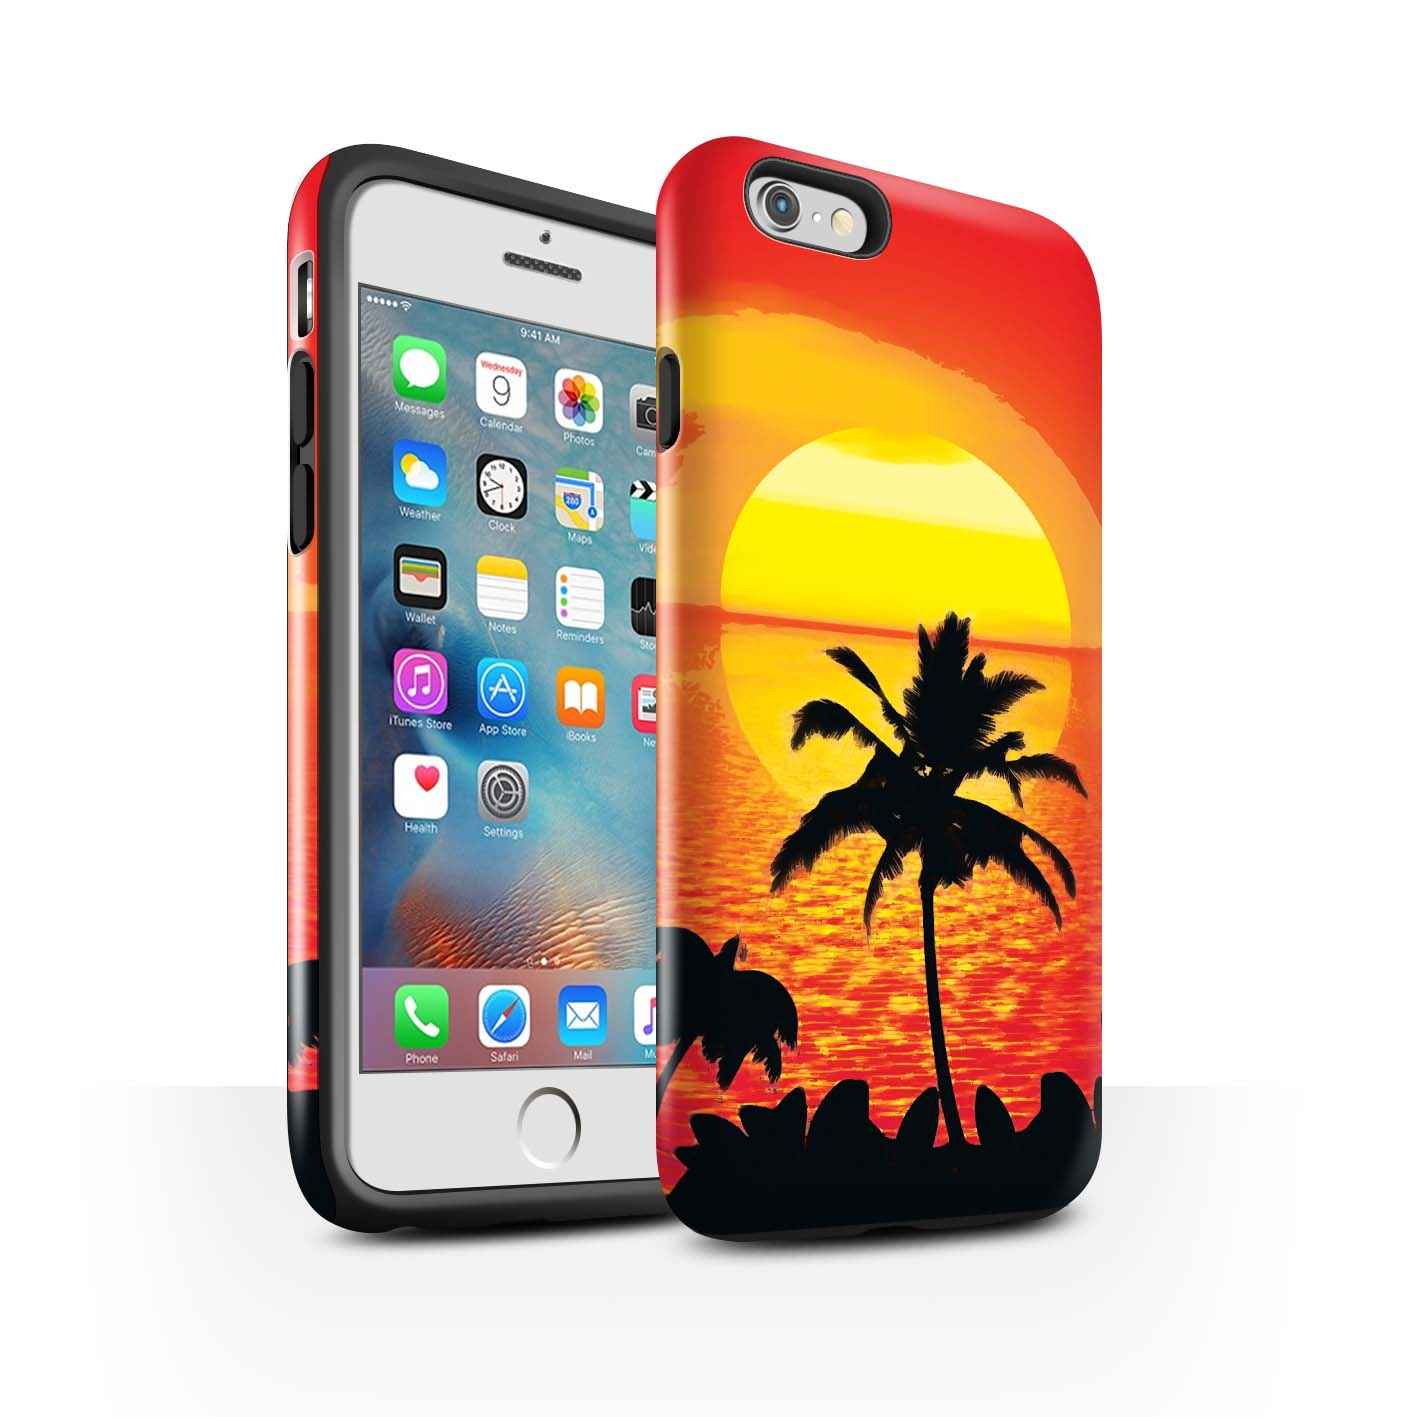 STUFF4-Gloss-Tough-Phone-Case-for-Apple-iPhone-6S-Plus-Beautiful-World-Art